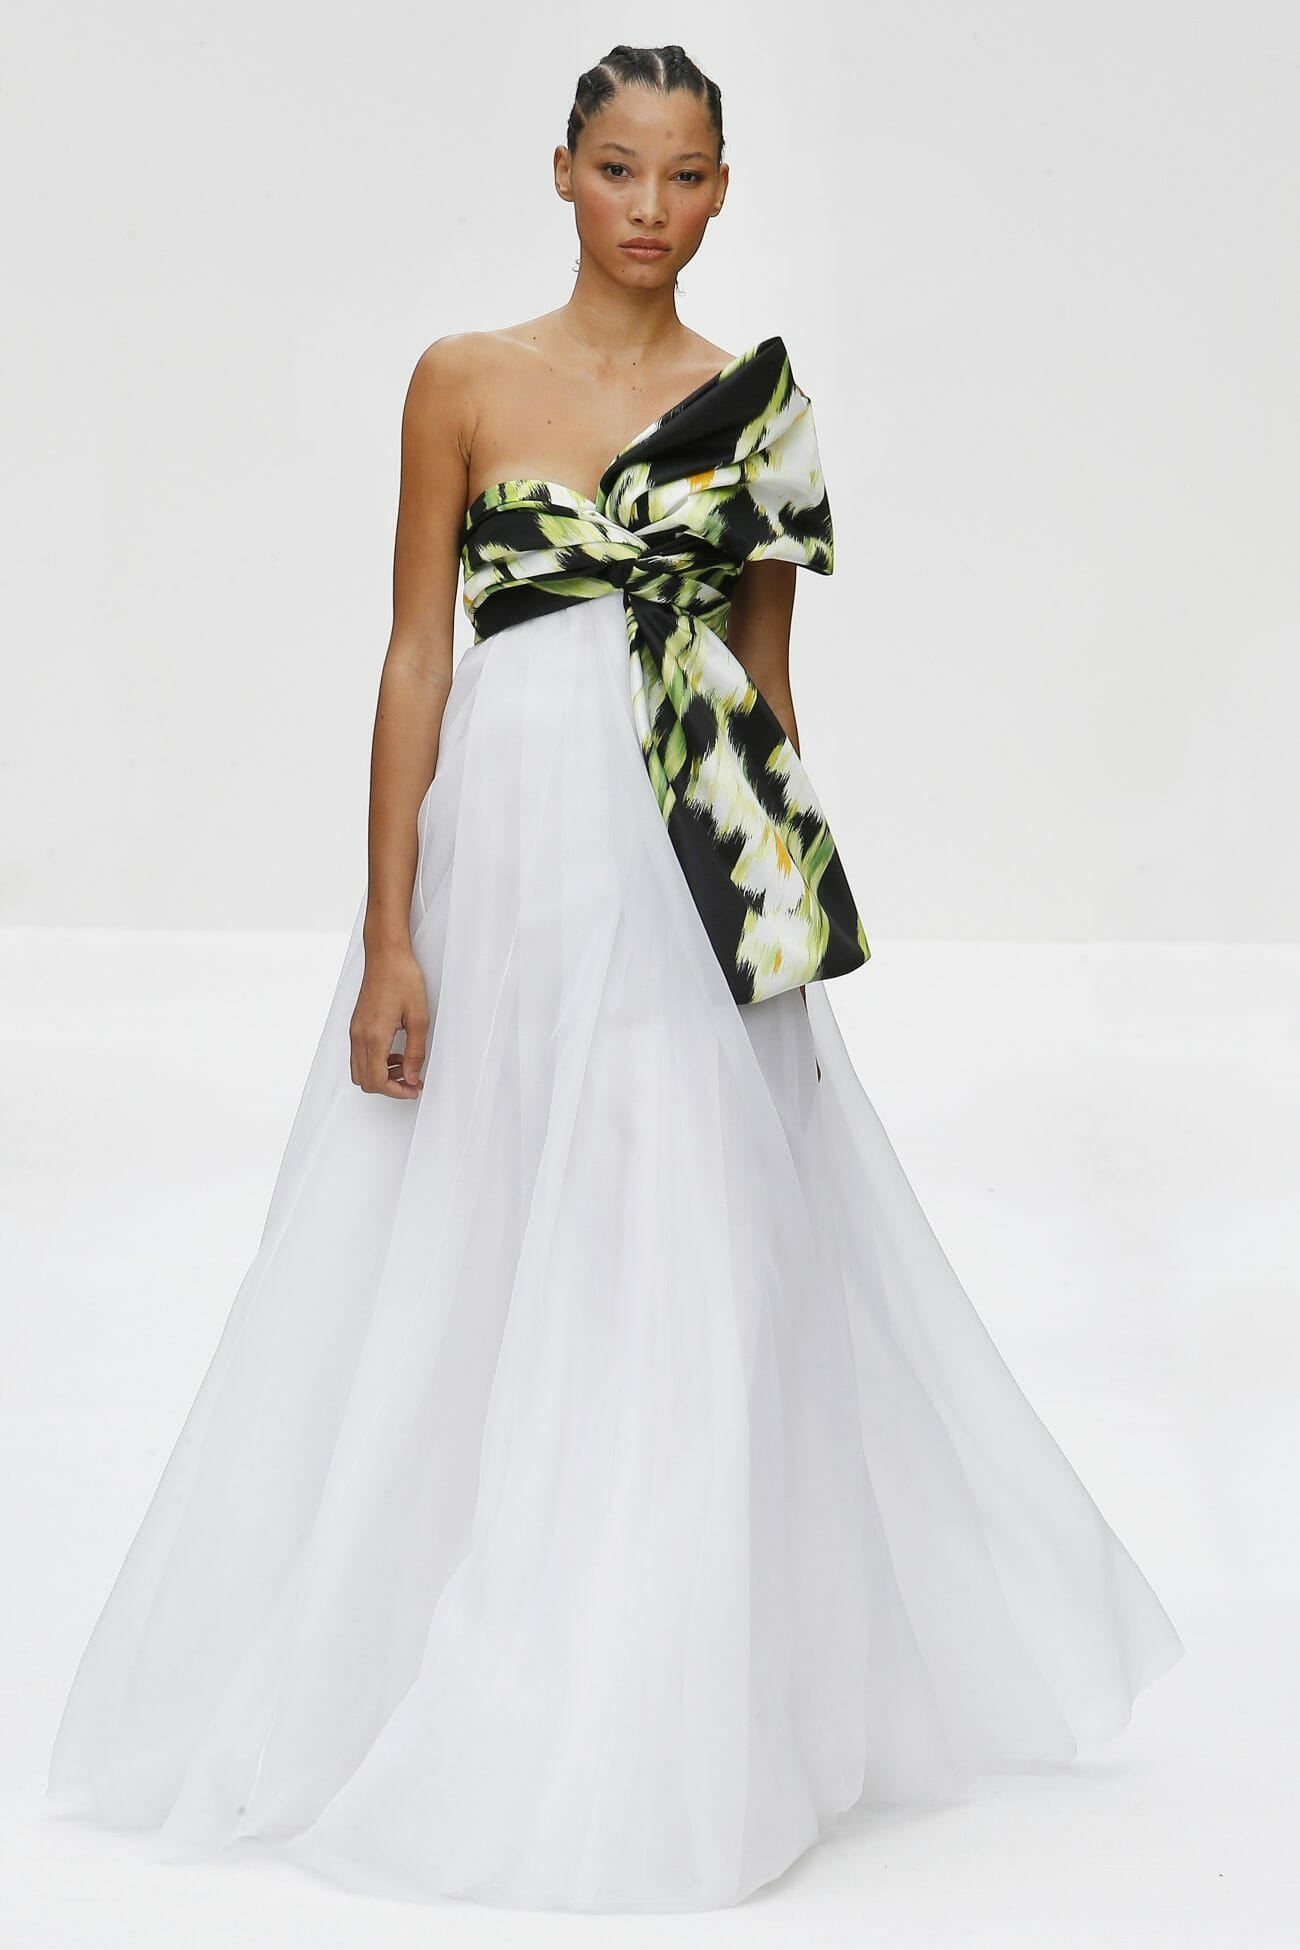 Carolina Herrera New York white dress floral top